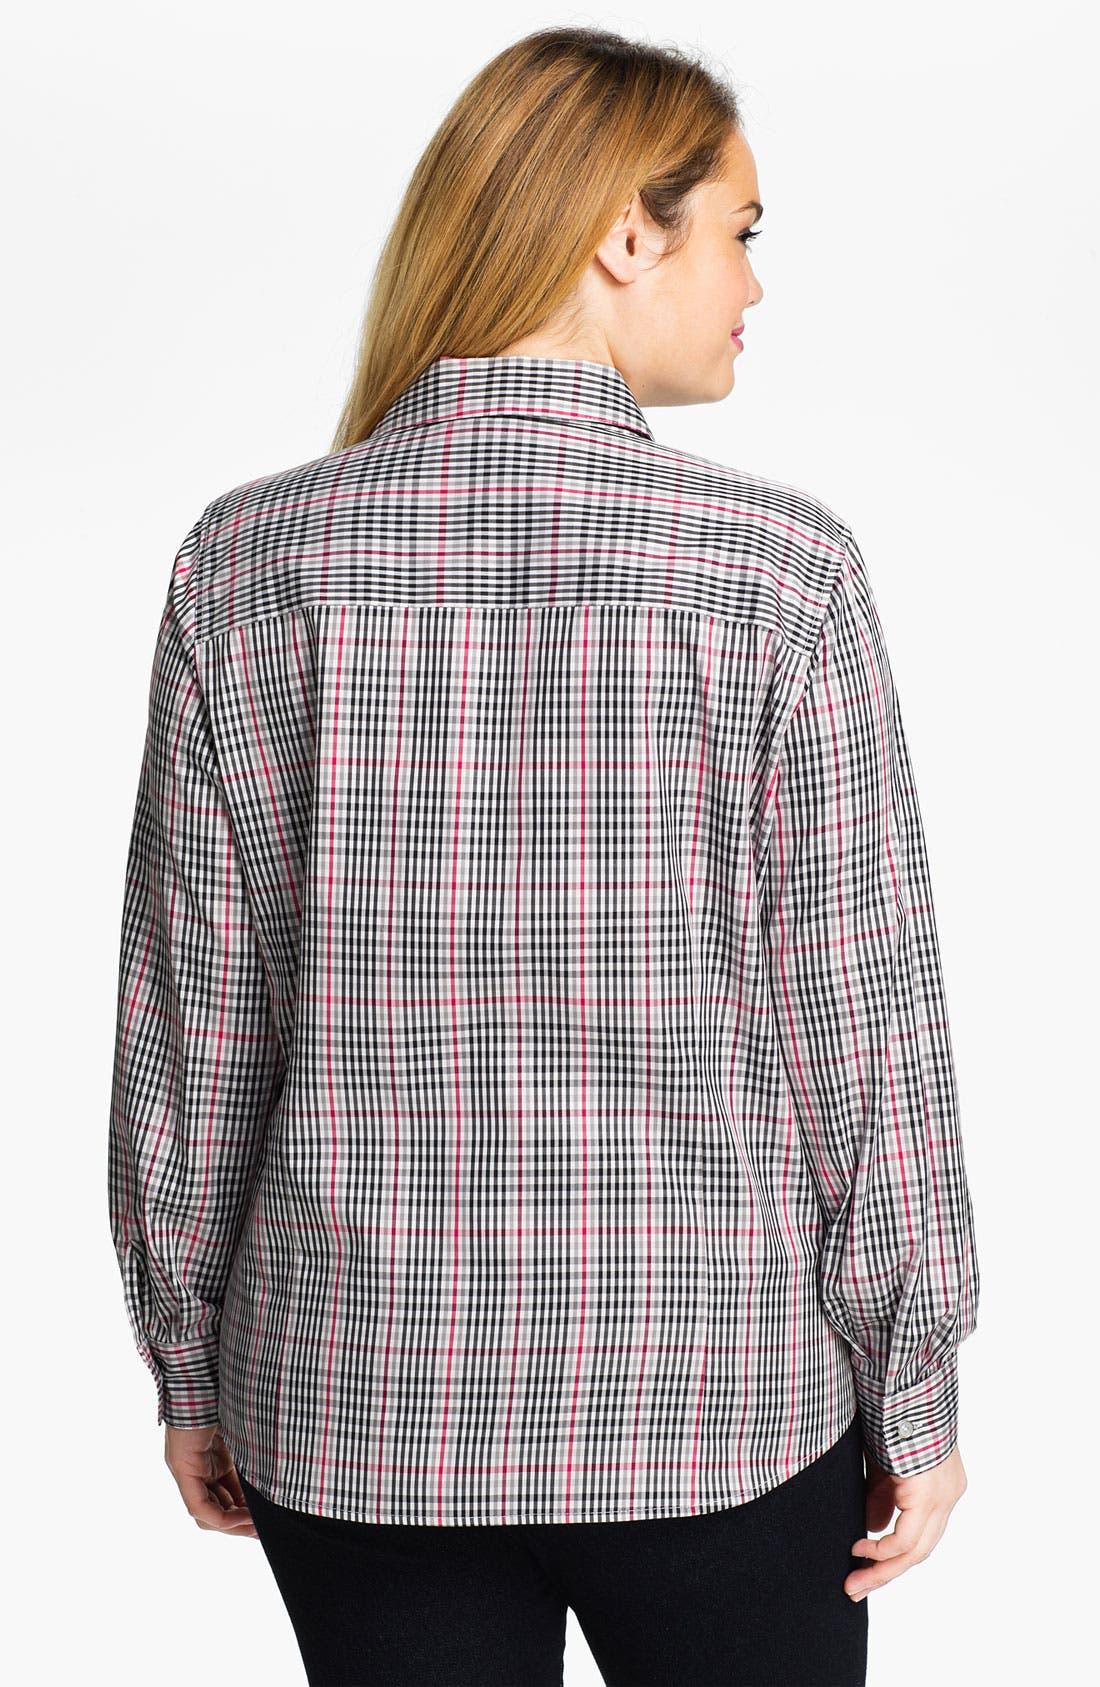 Alternate Image 2  - Foxcroft 'Holiday Check' Wrinkle Free Shaped Shirt (Plus)